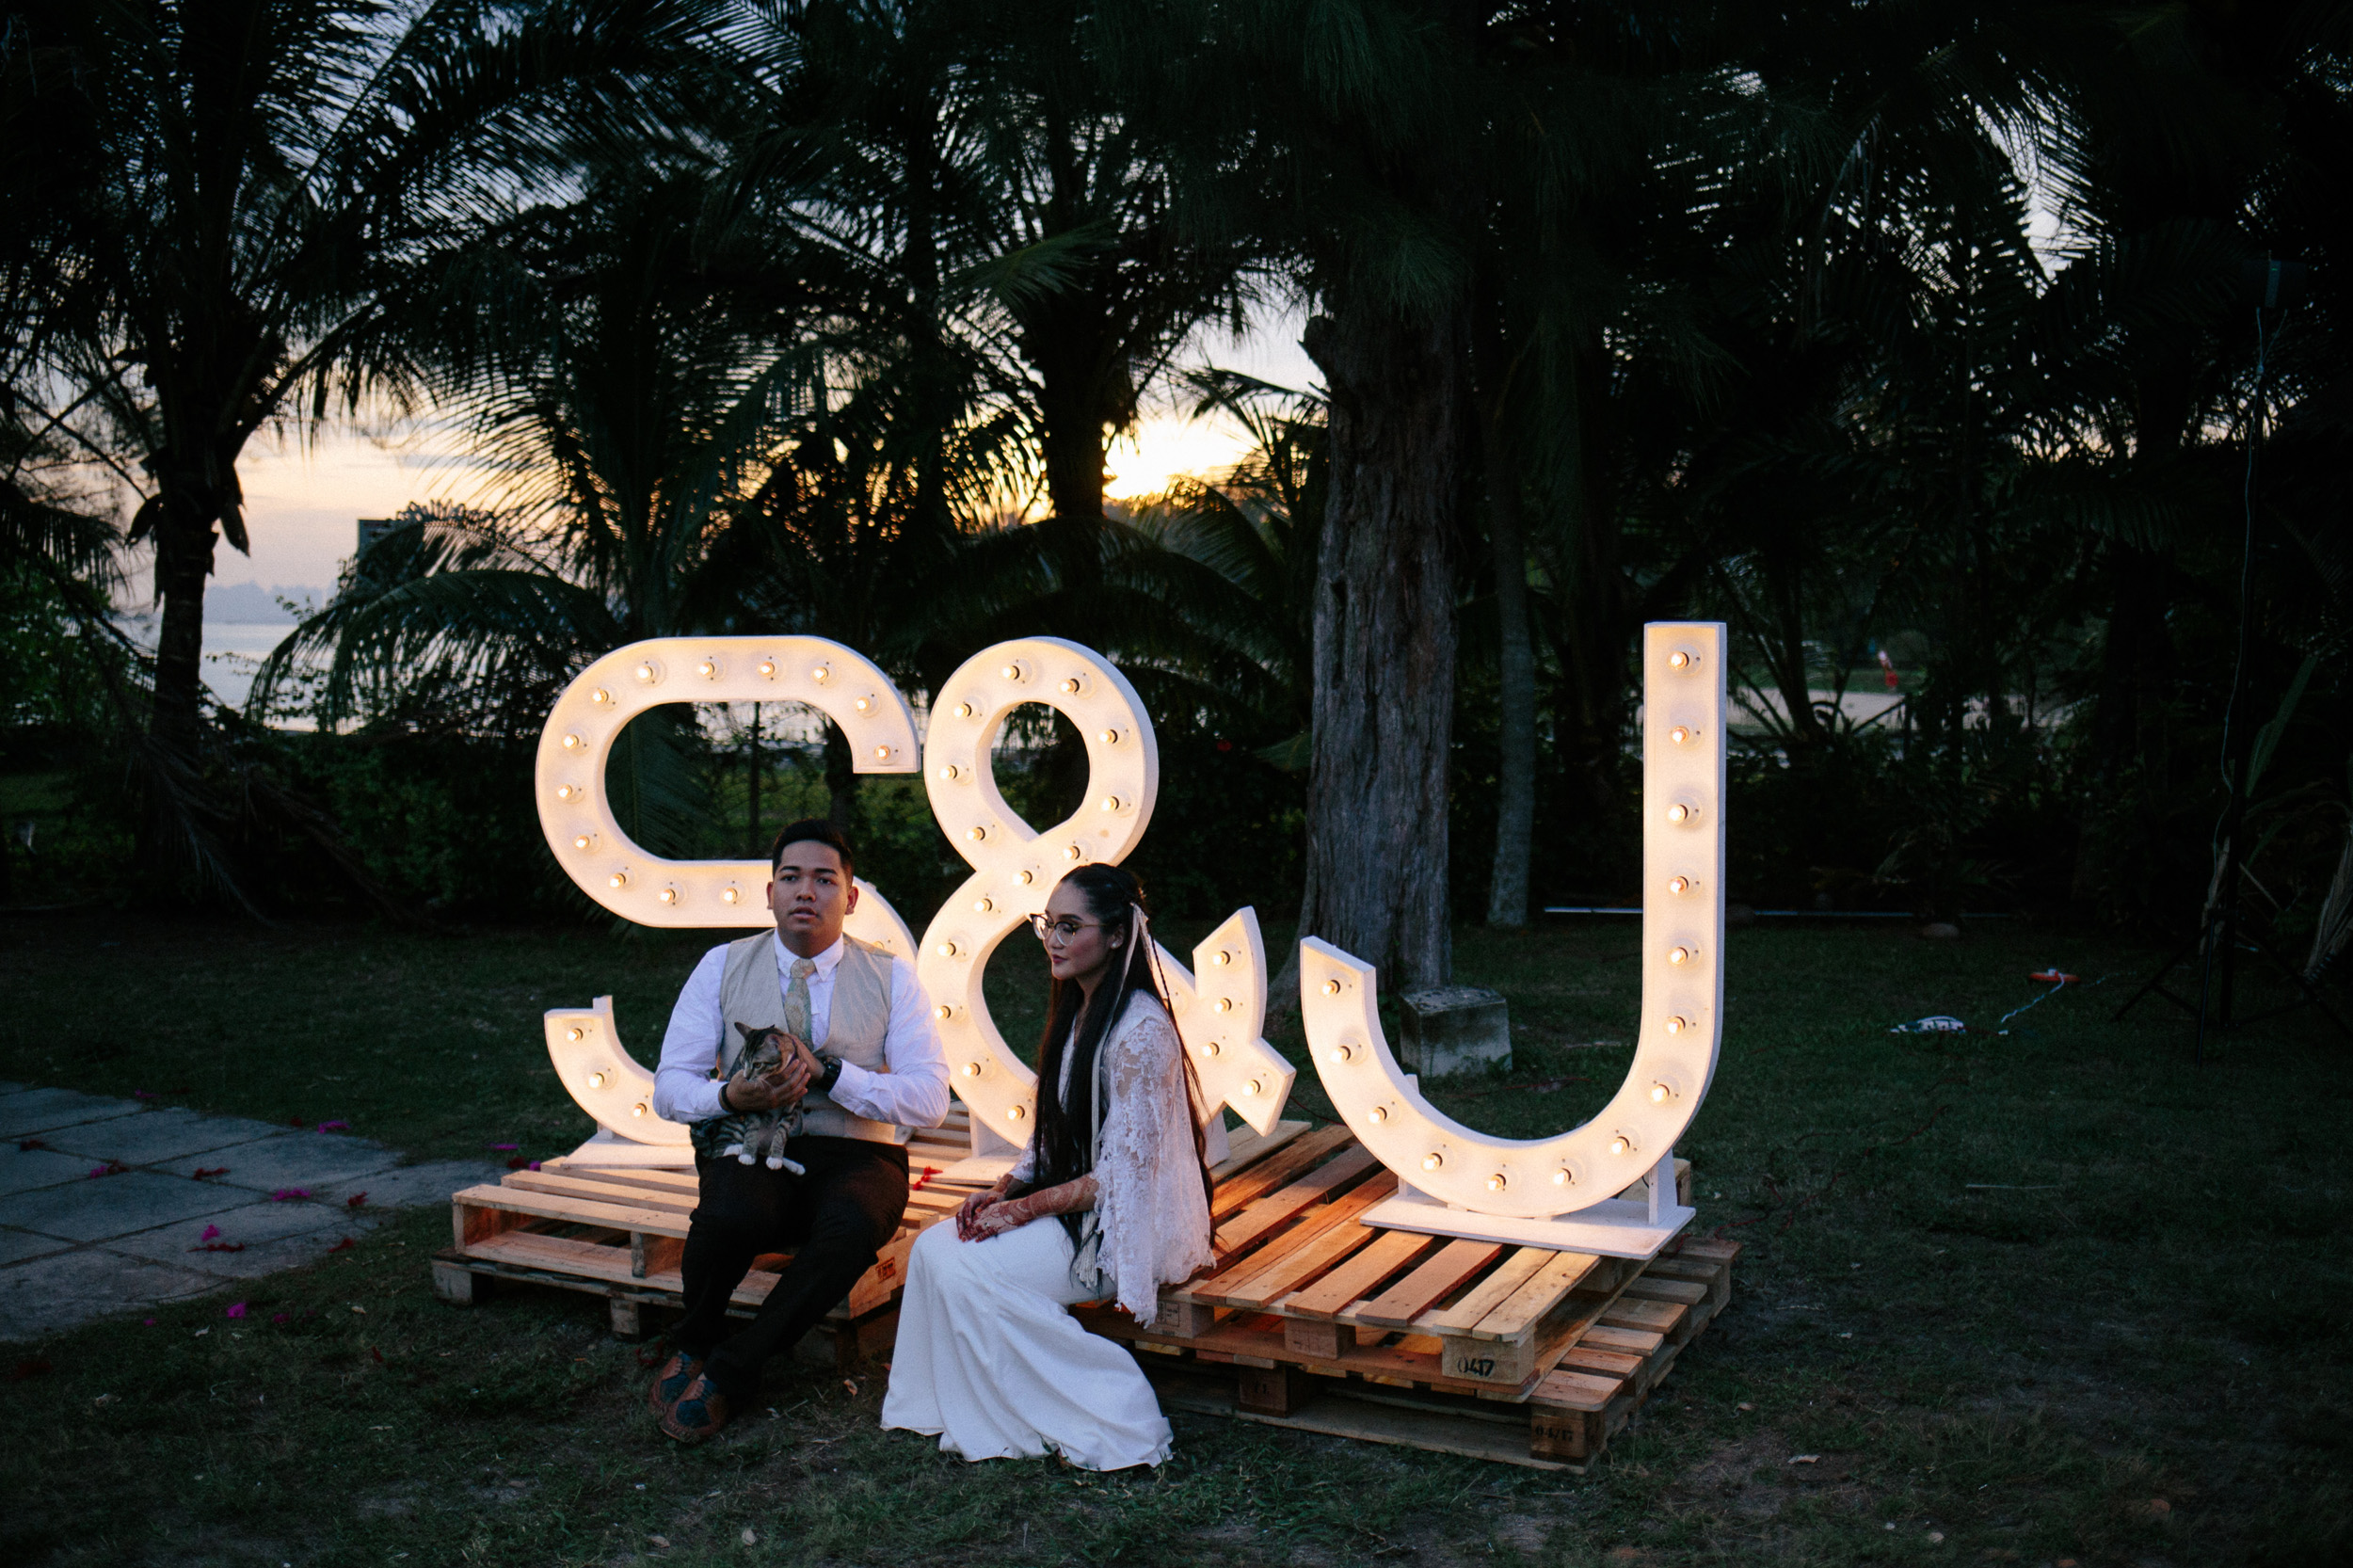 singapore-wedding-photographer-photography-wmt2017-158.jpg